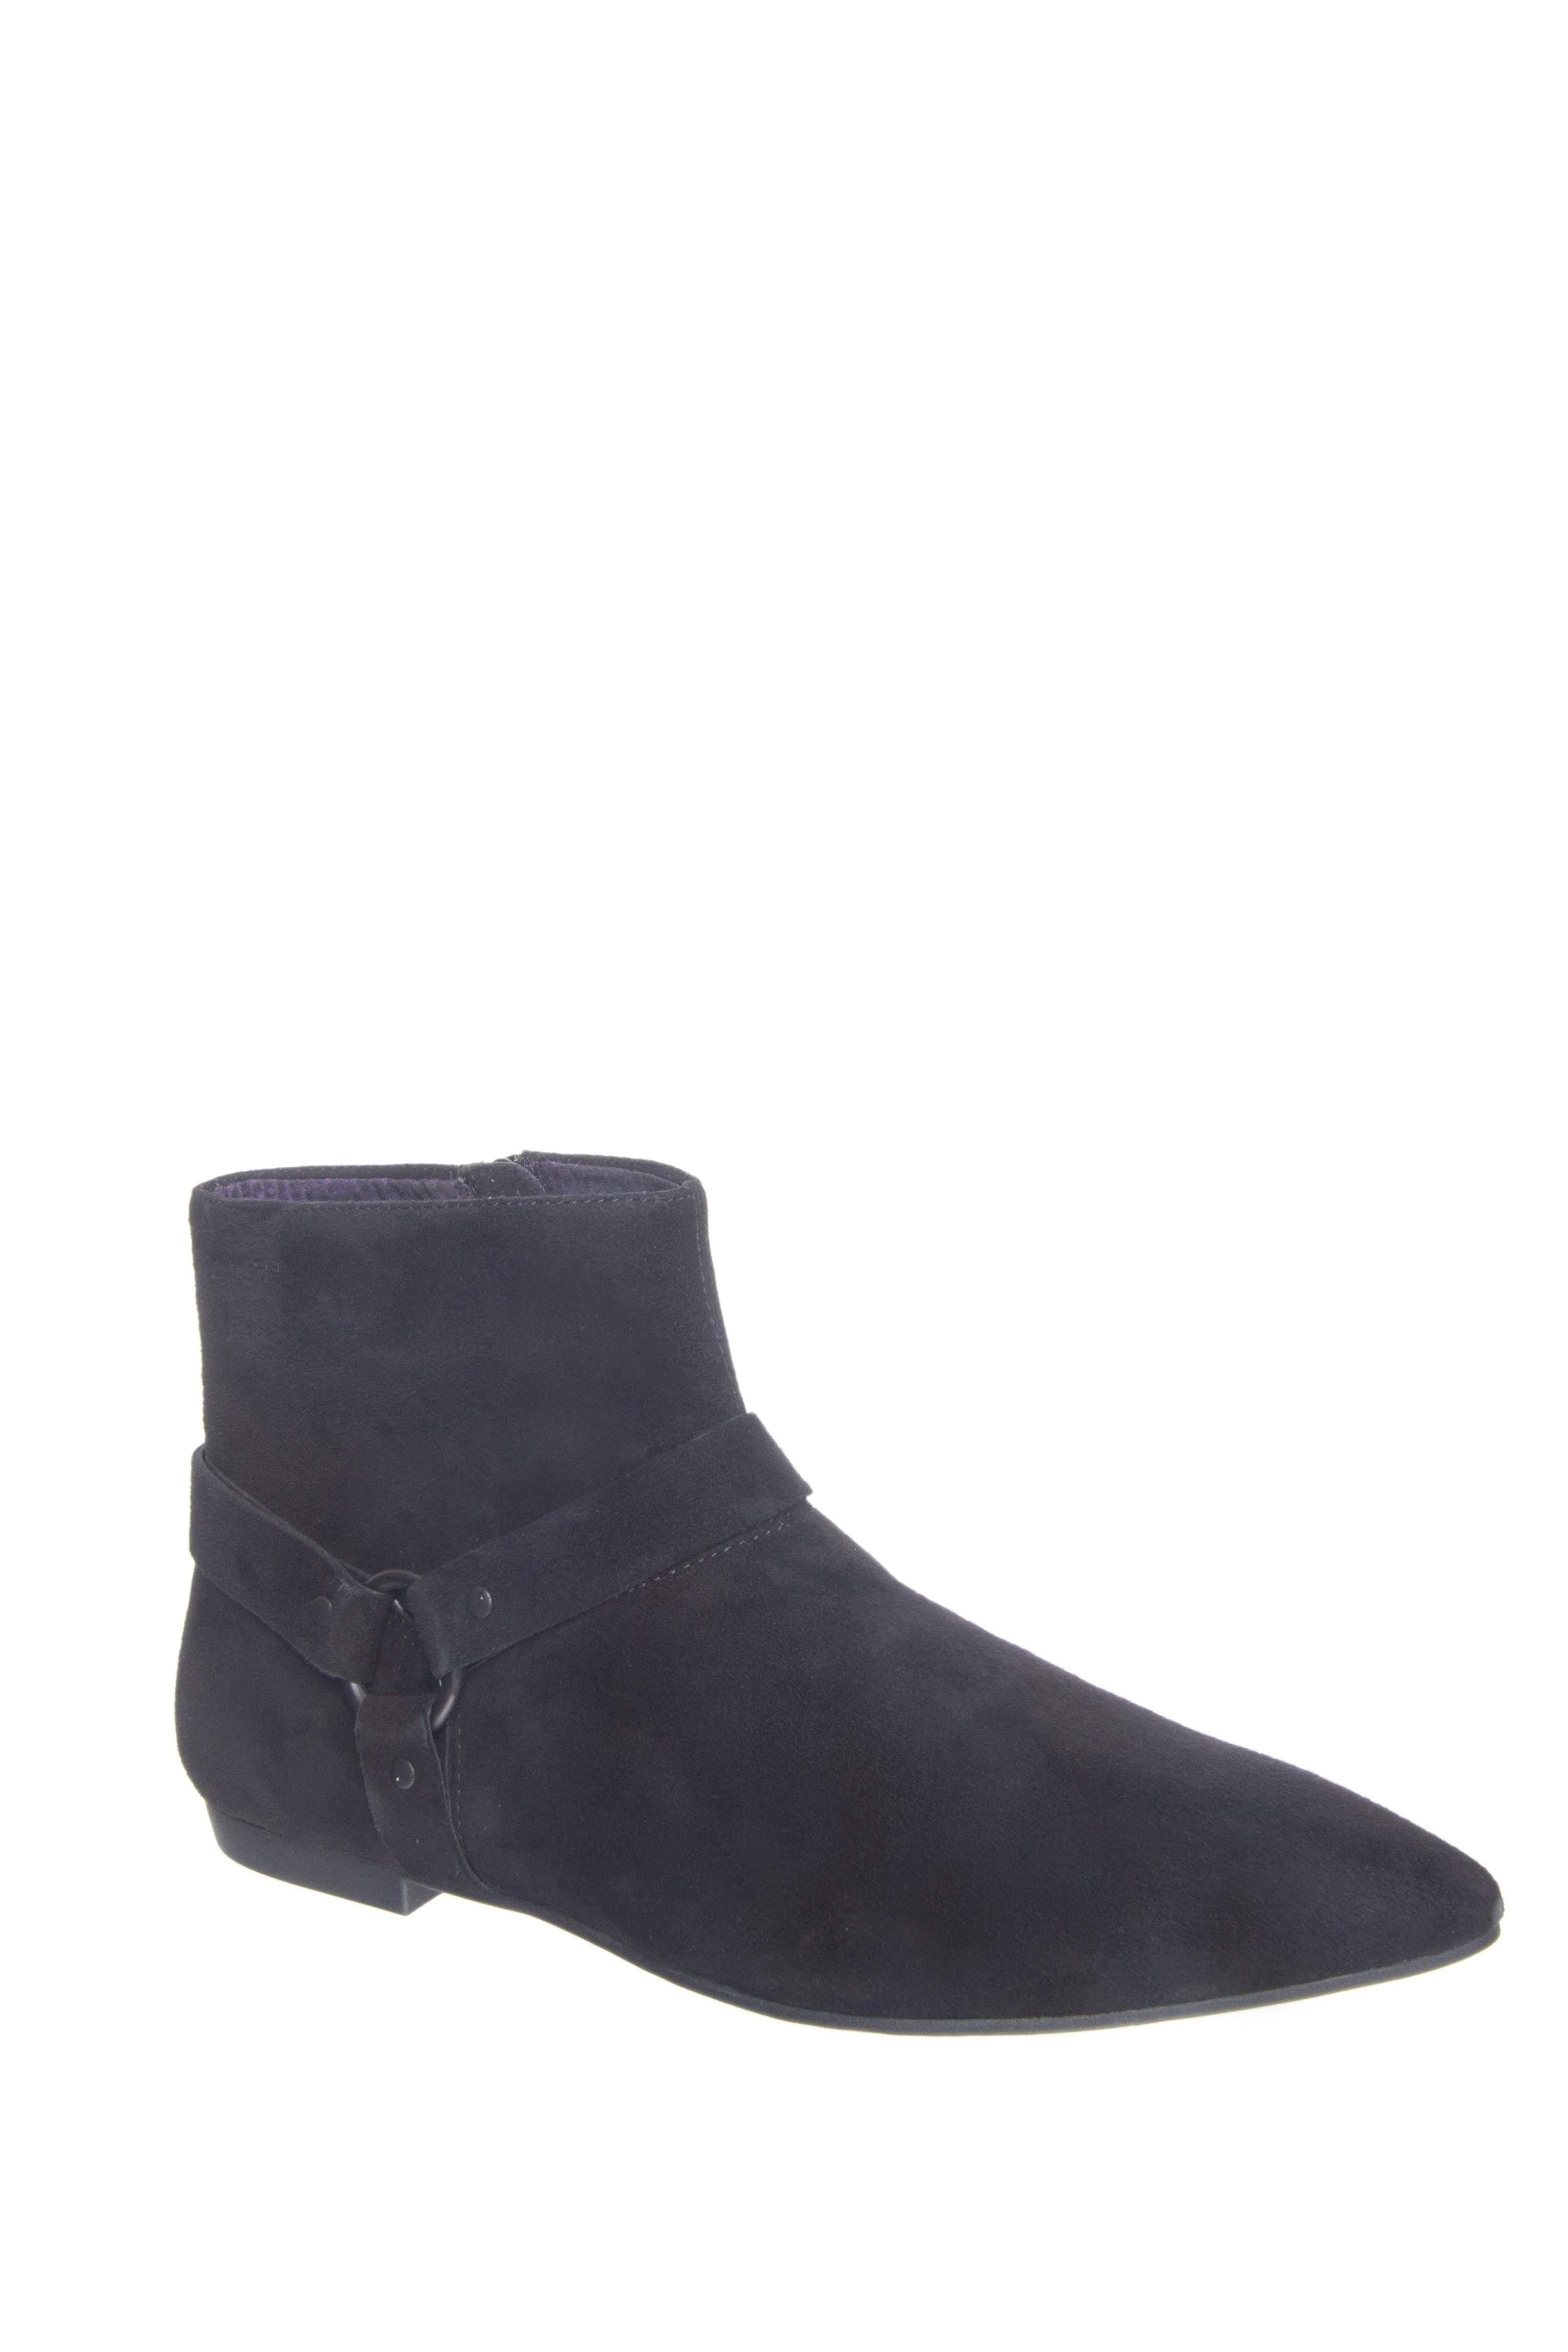 Vagabond Katlin Pointed-Toe Low Heel Booties - Black Suede